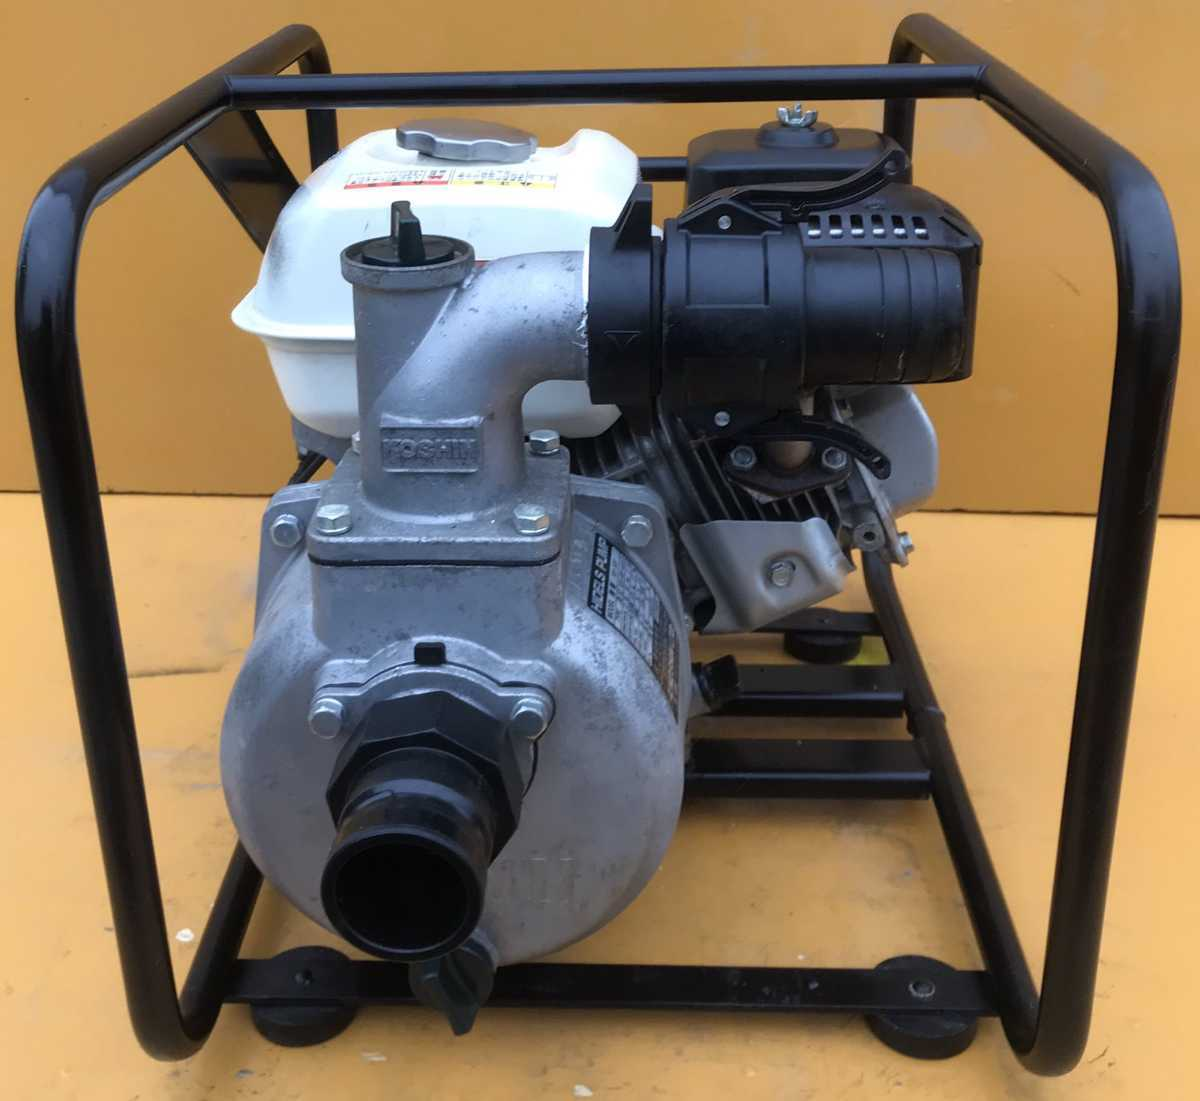 KOSHIN 工進 ハイデルスポンプ エンジンポンプ KH-50P honda gp160 美品 _画像3